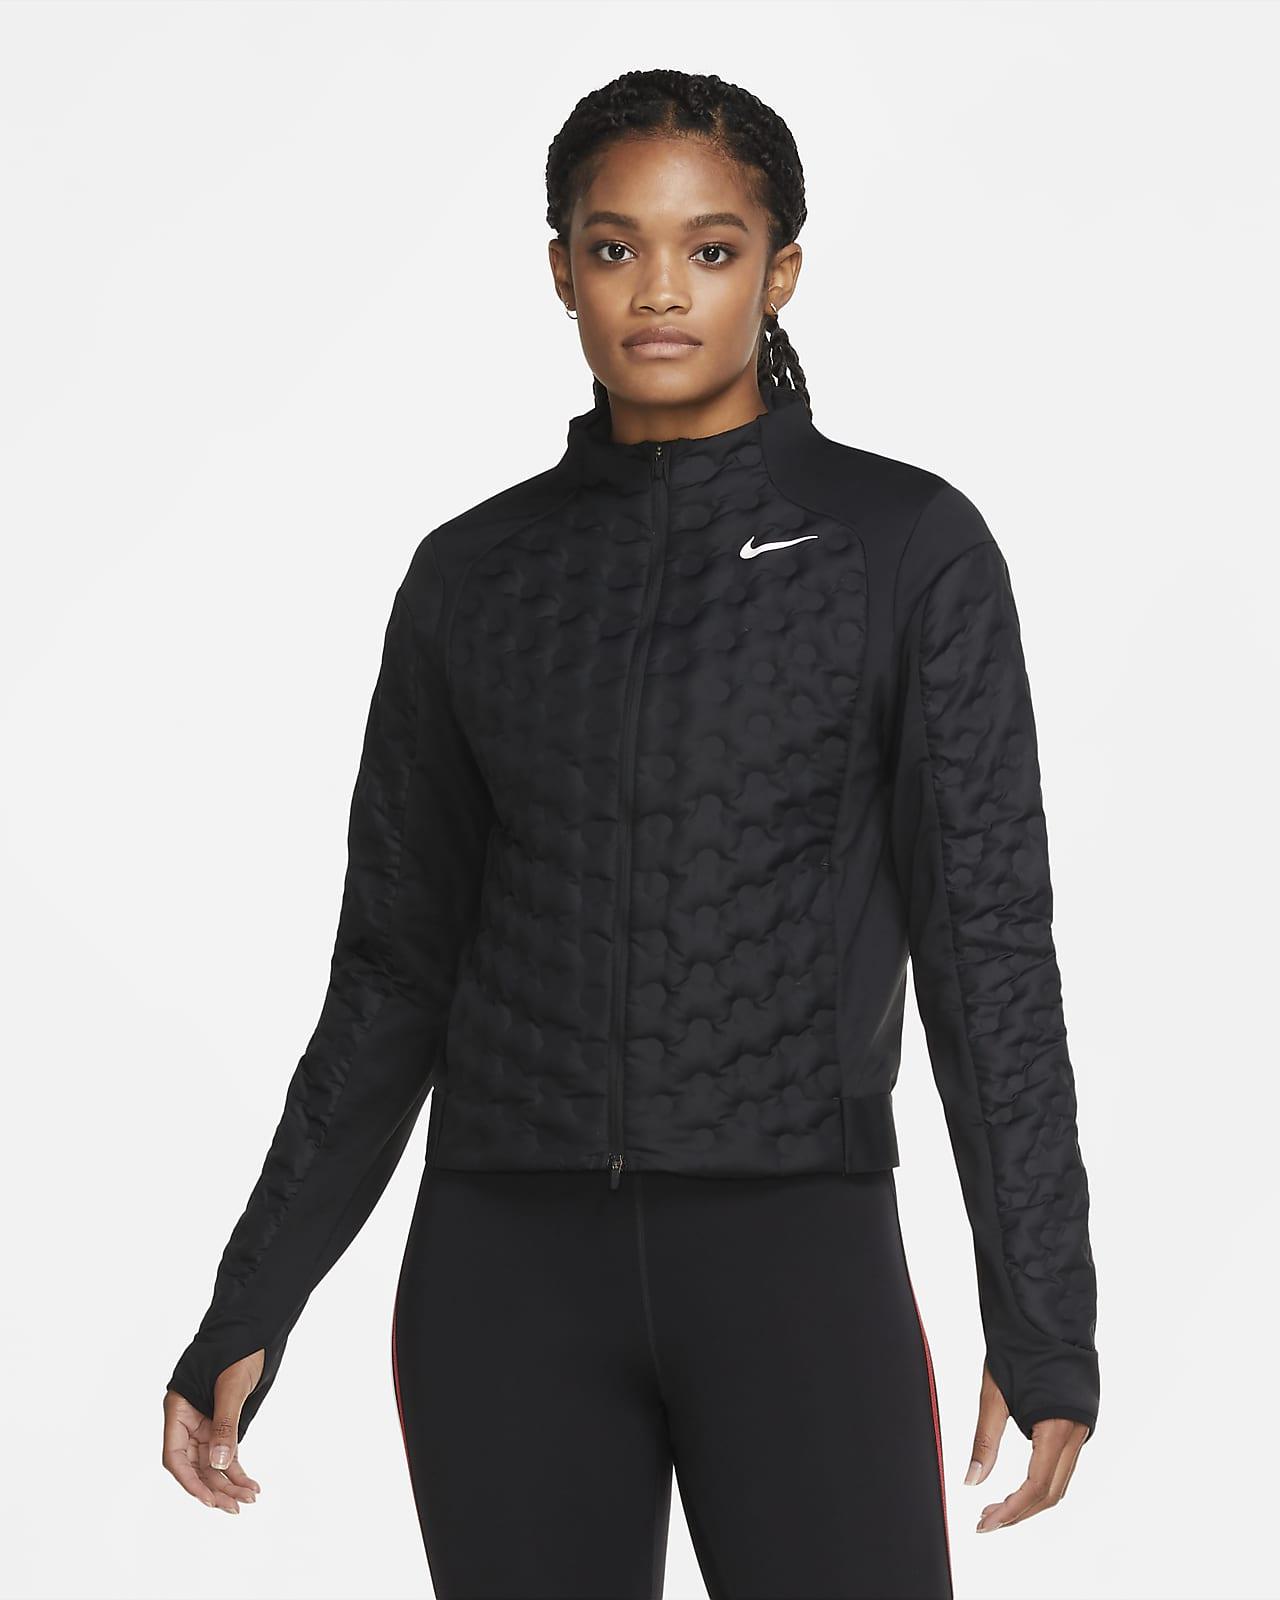 Veste de running Nike Aeroloft pour Femme